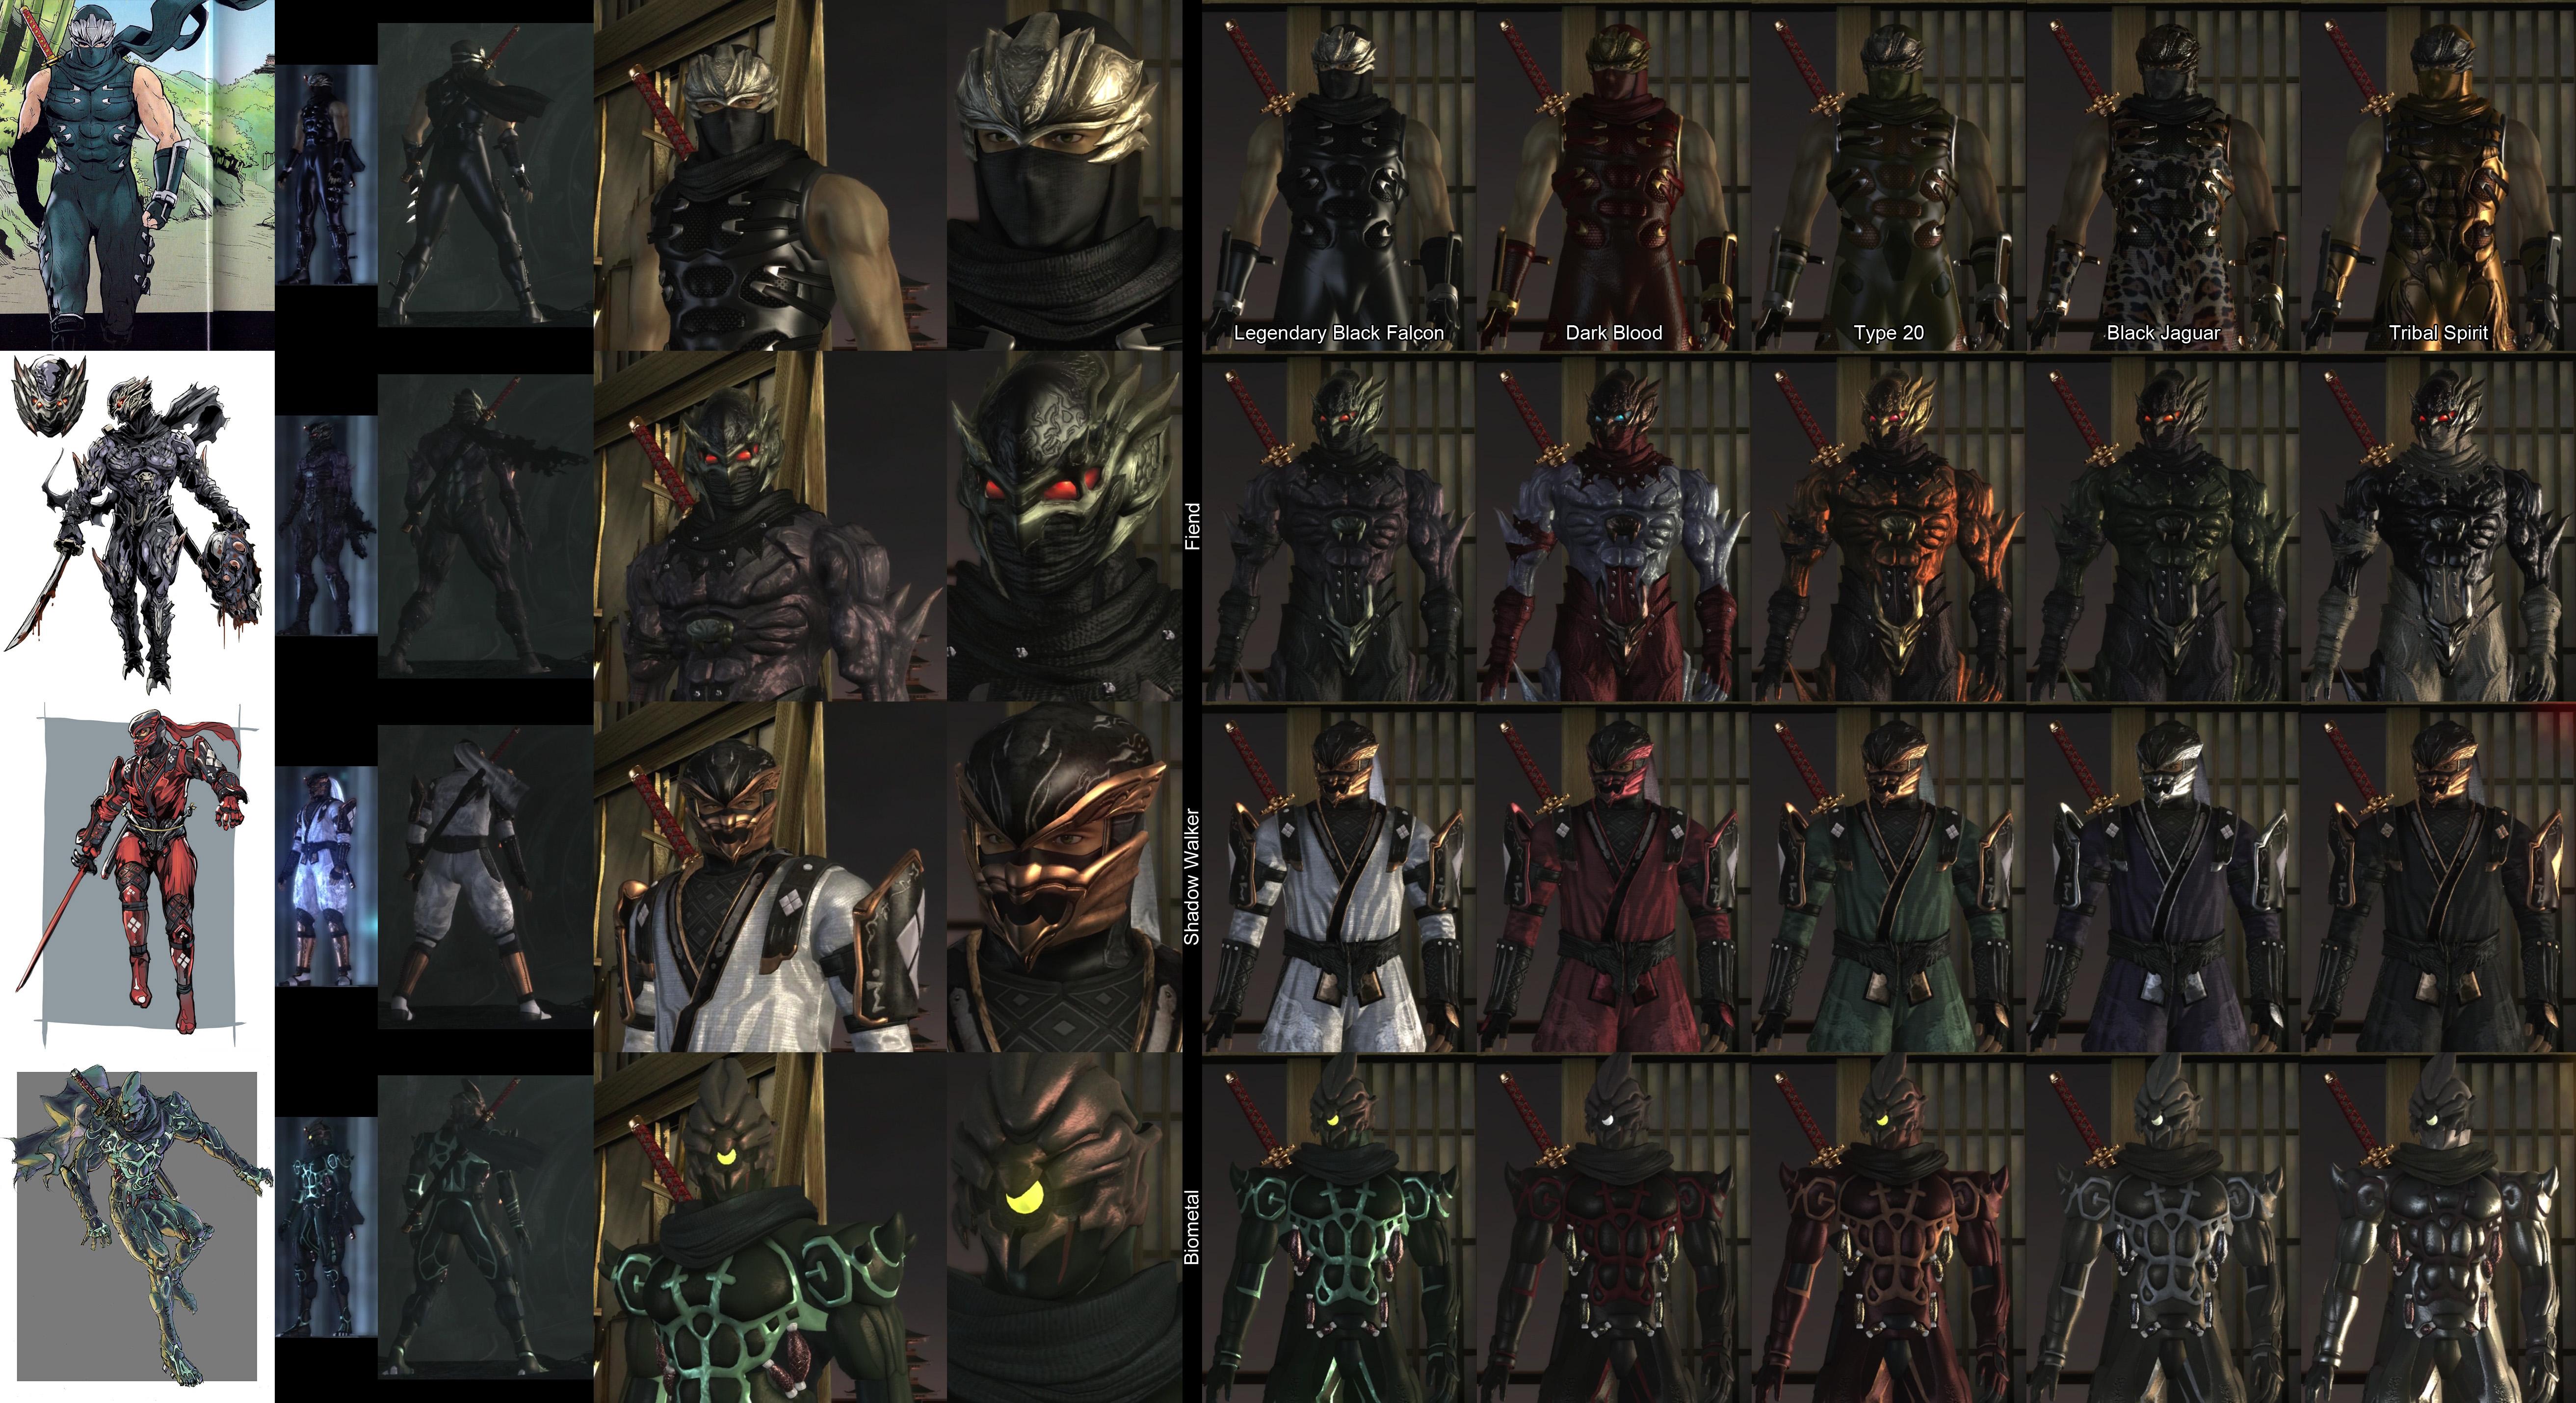 Costumes | Ninja Gaiden Wiki | FANDOM powered by Wikia